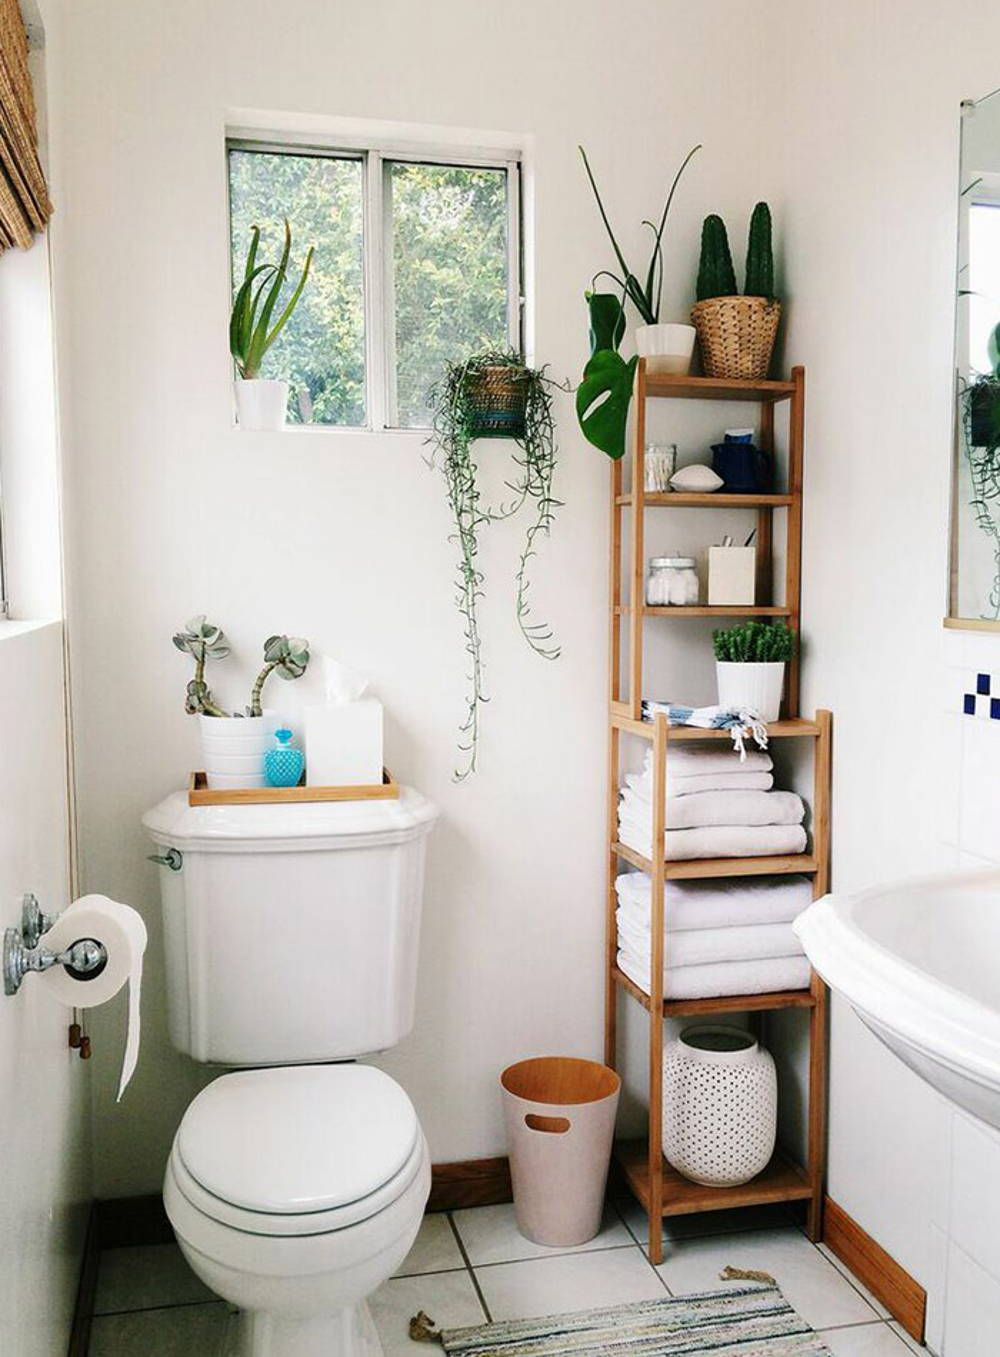 How To Make A Small Bathroom Look Bigger Atap Co Small Bathroom Diy Small Bathroom Decor Small Apartment Decorating